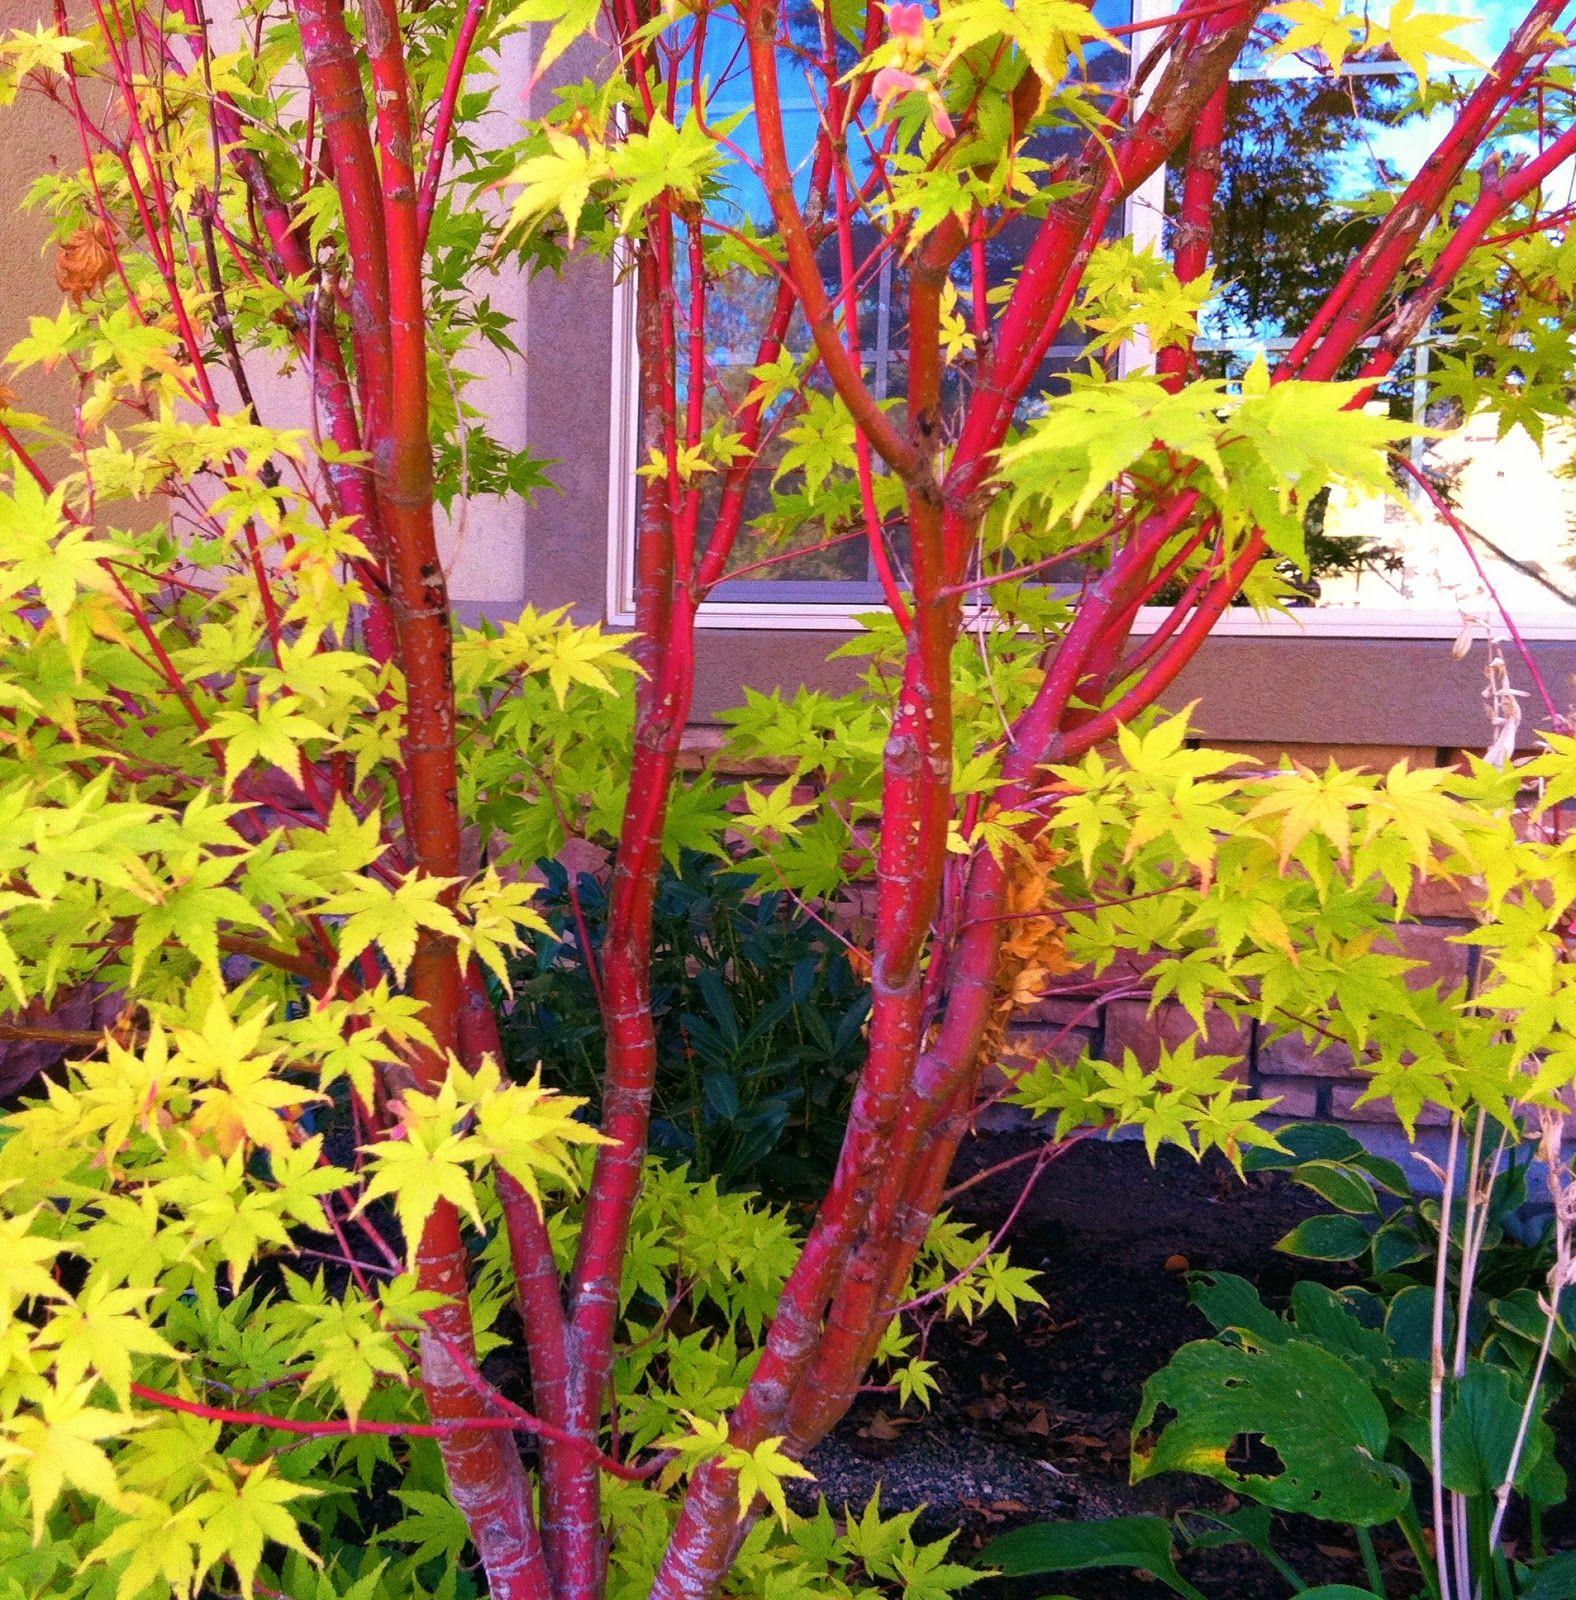 Japanese Garden Plants: Acer Palmatum 'Sangokaku' (Coral Bark Japanese Maple